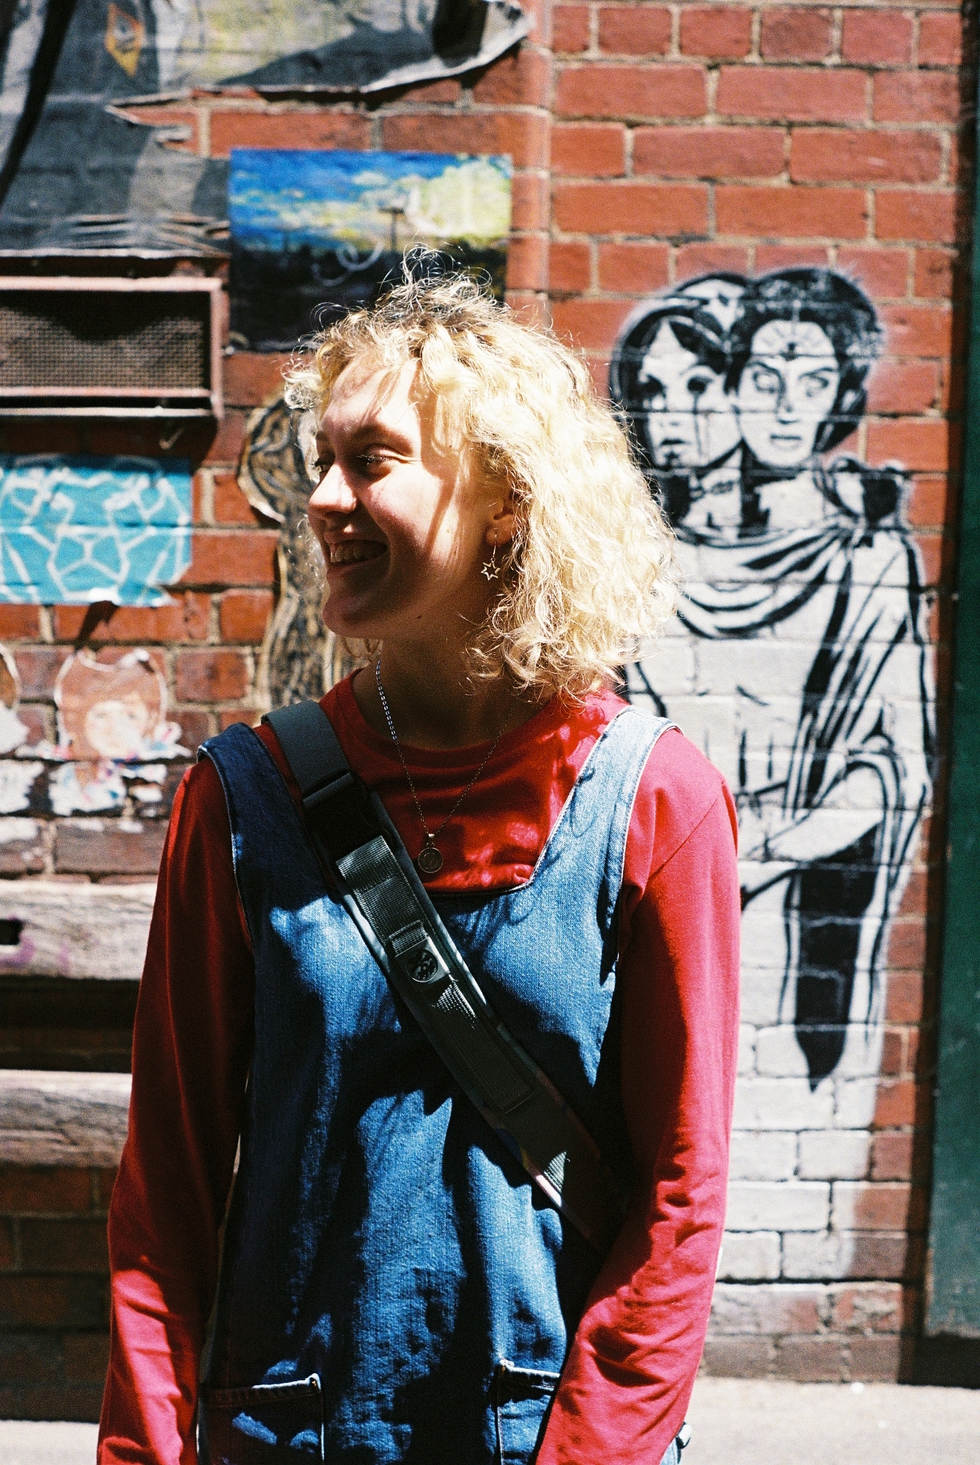 ruby ryan photo photograph photography film 35mm friend melbourne girl laneway